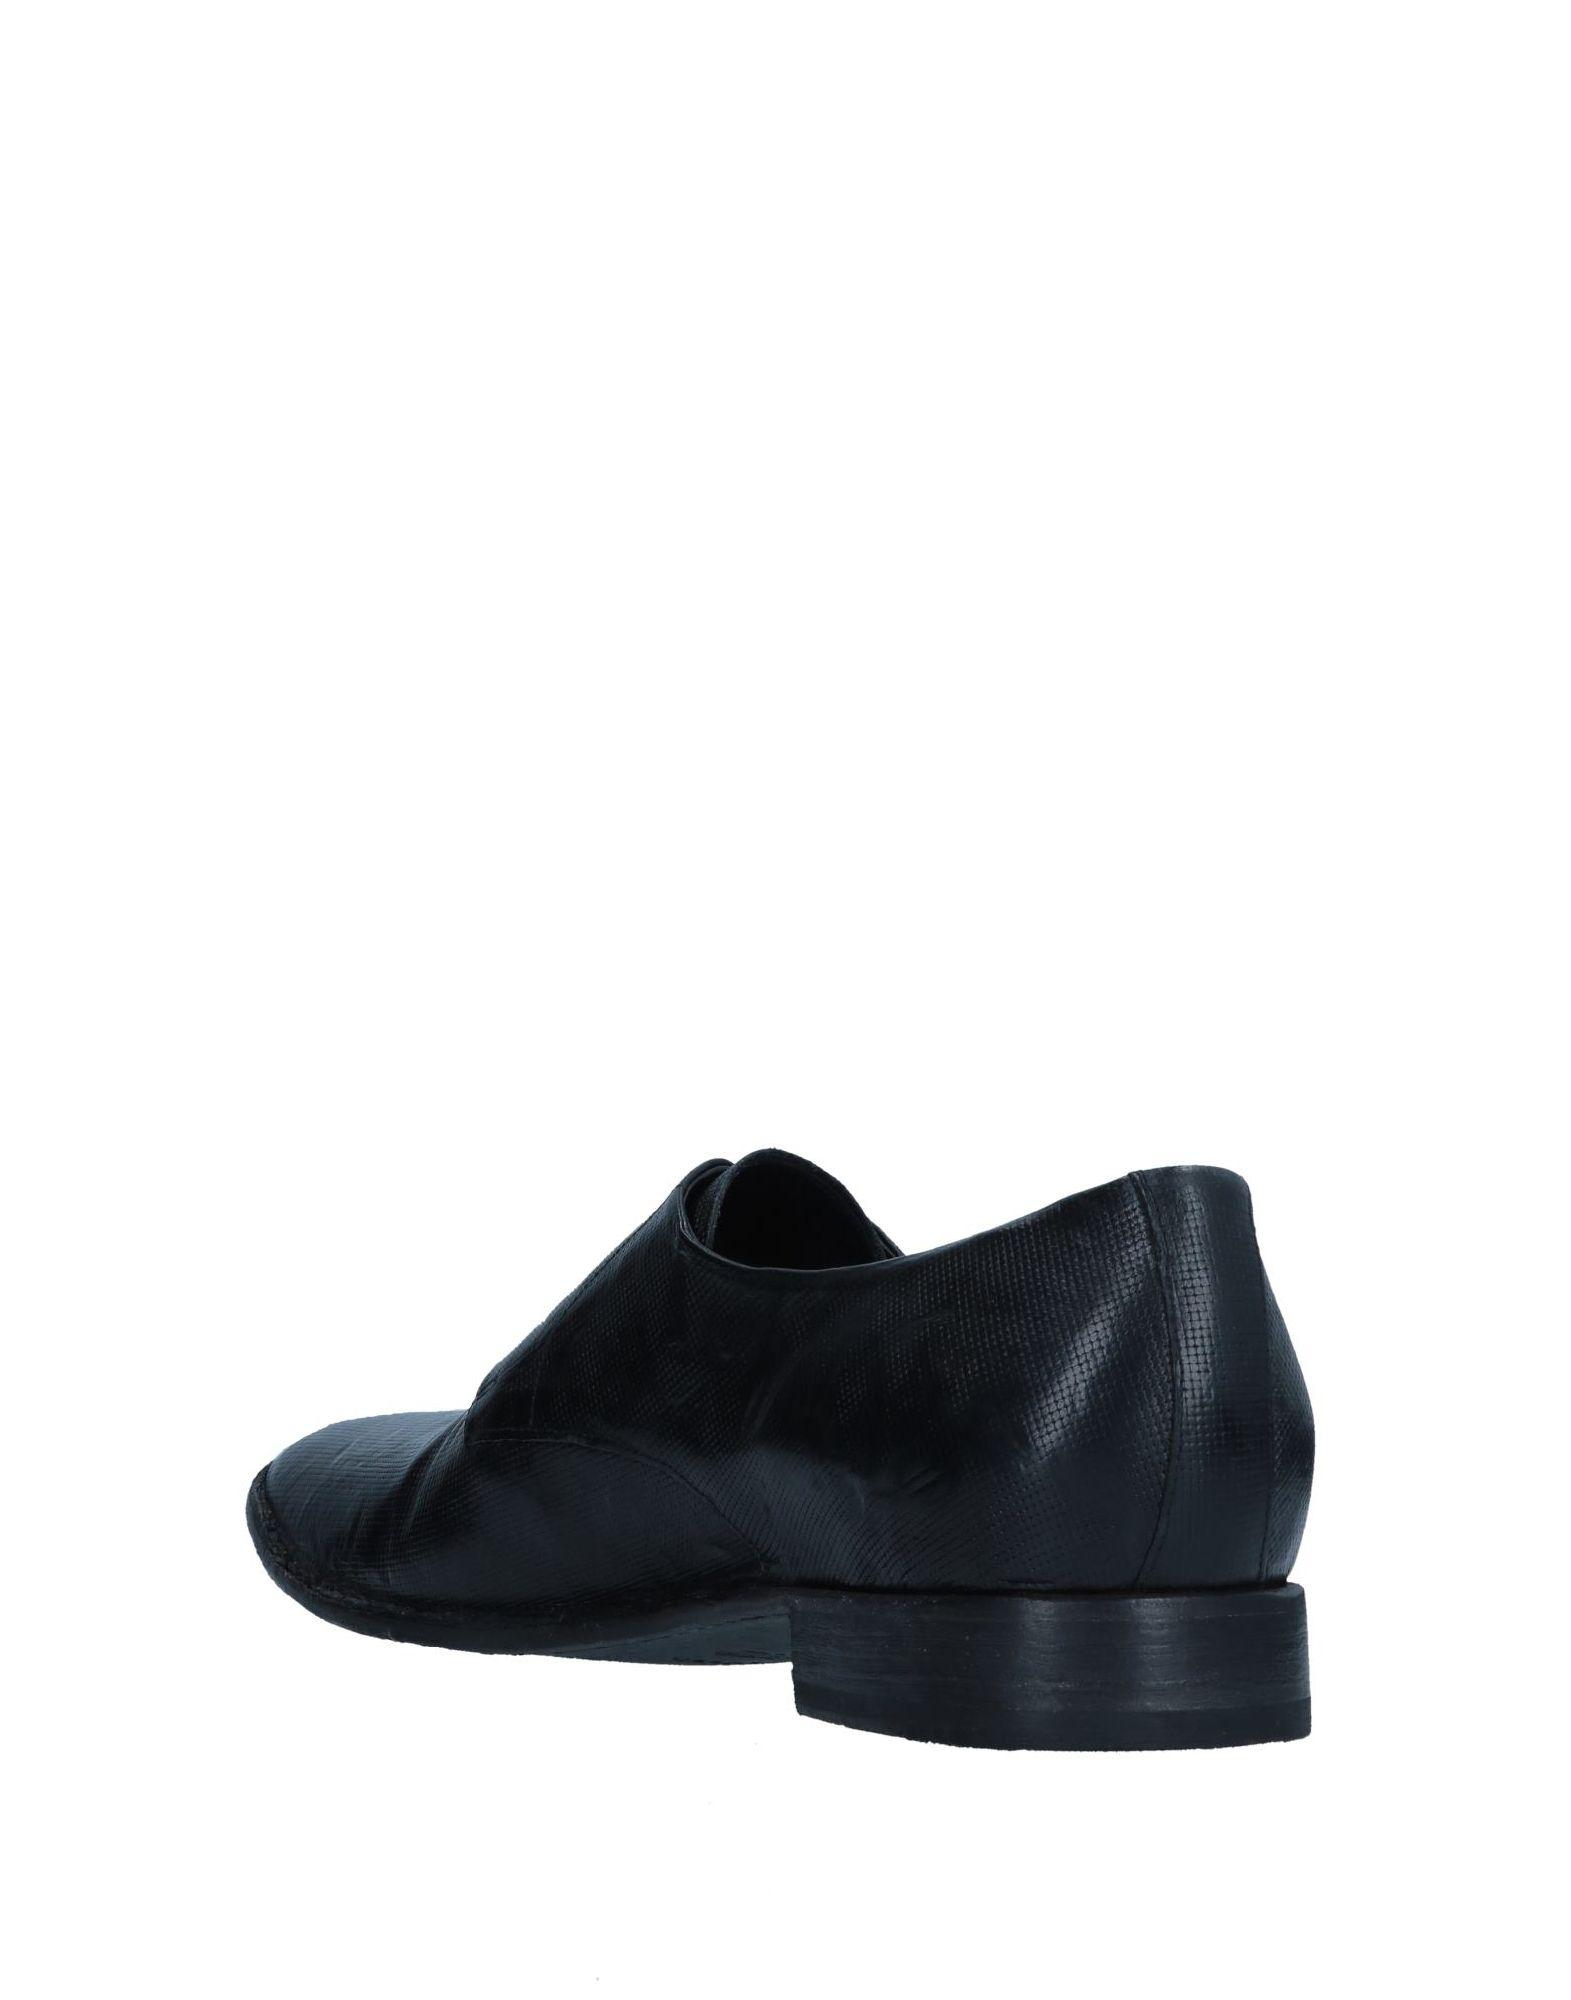 Ducanero 11546822KA Schnürschuhe Herren  11546822KA Ducanero Gute Qualität beliebte Schuhe e75e0a